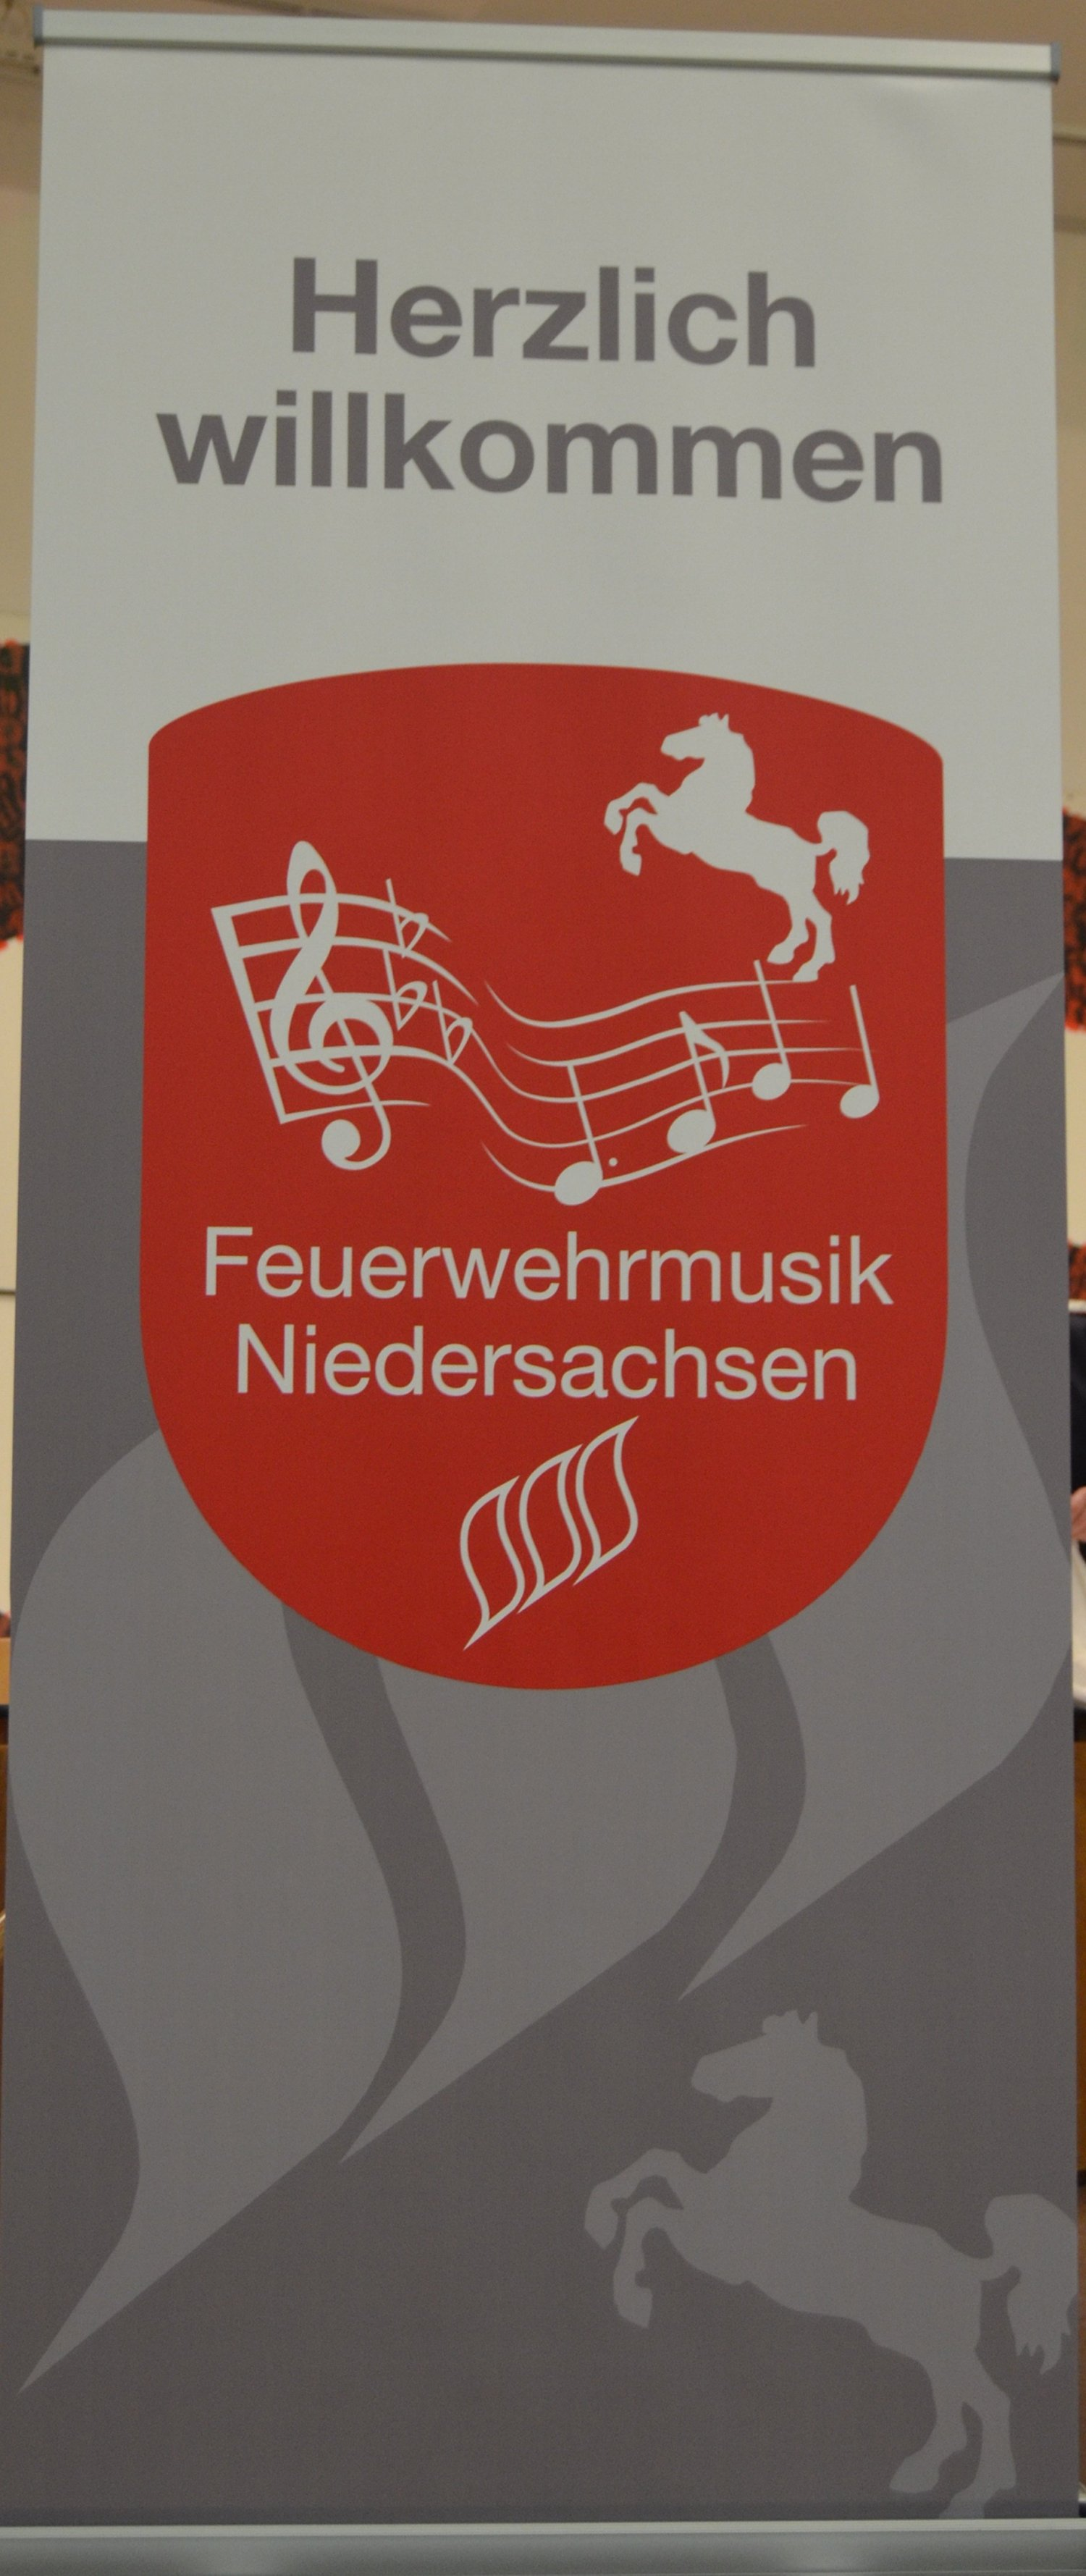 2017-03-03-KfV-27-Verbandsversammlung